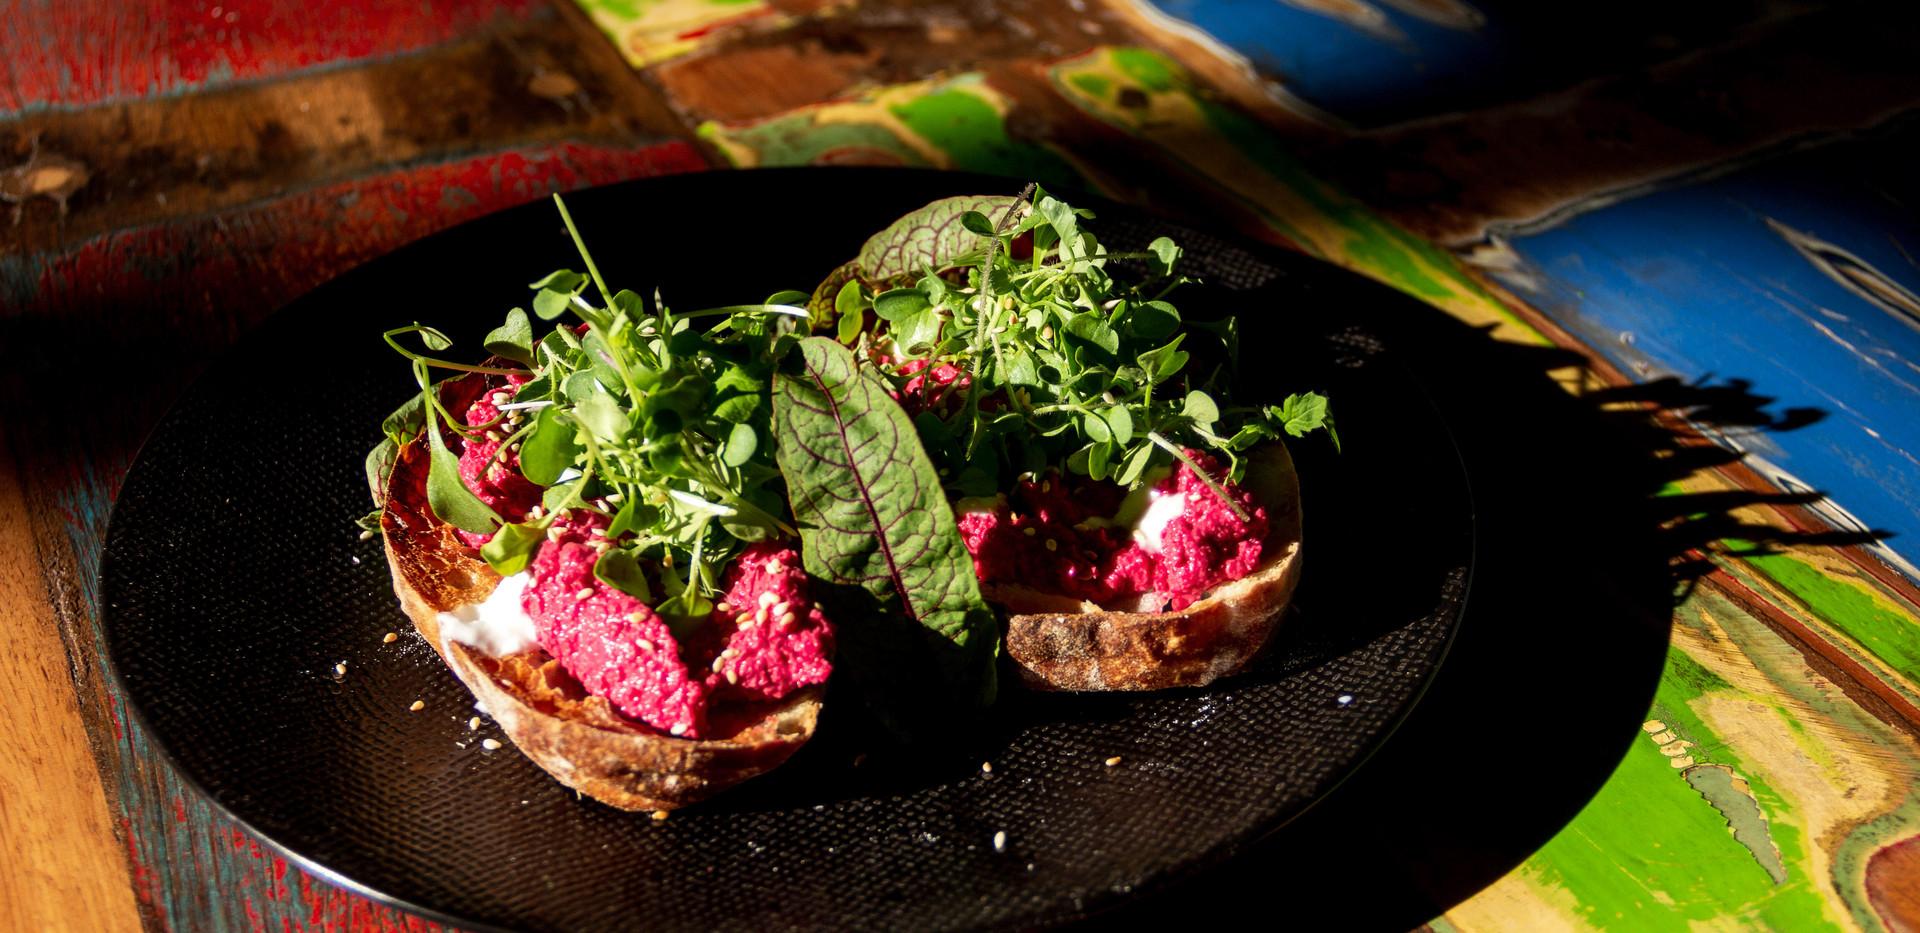 Breakfast: Beetroot-Hummus on sourdough bread with mustard microgreens